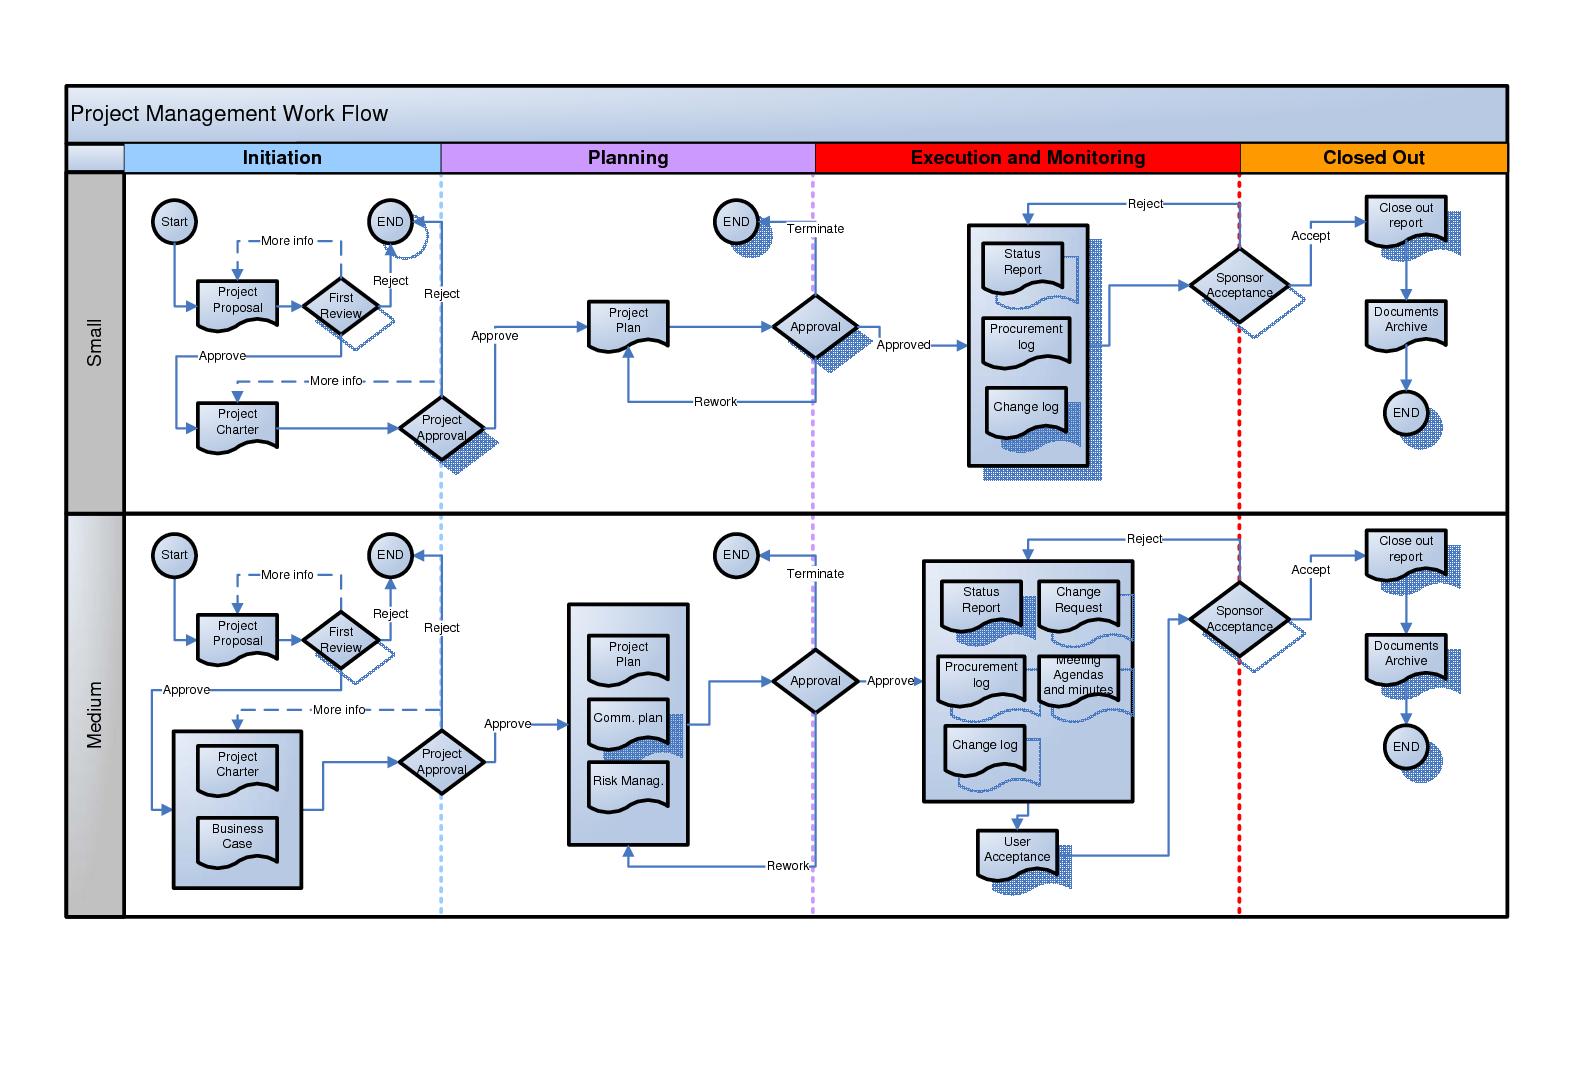 4d771f64c600548c400670eddd525bfa48e375c6?1511888427 process flow diagram examples visio best wiring library